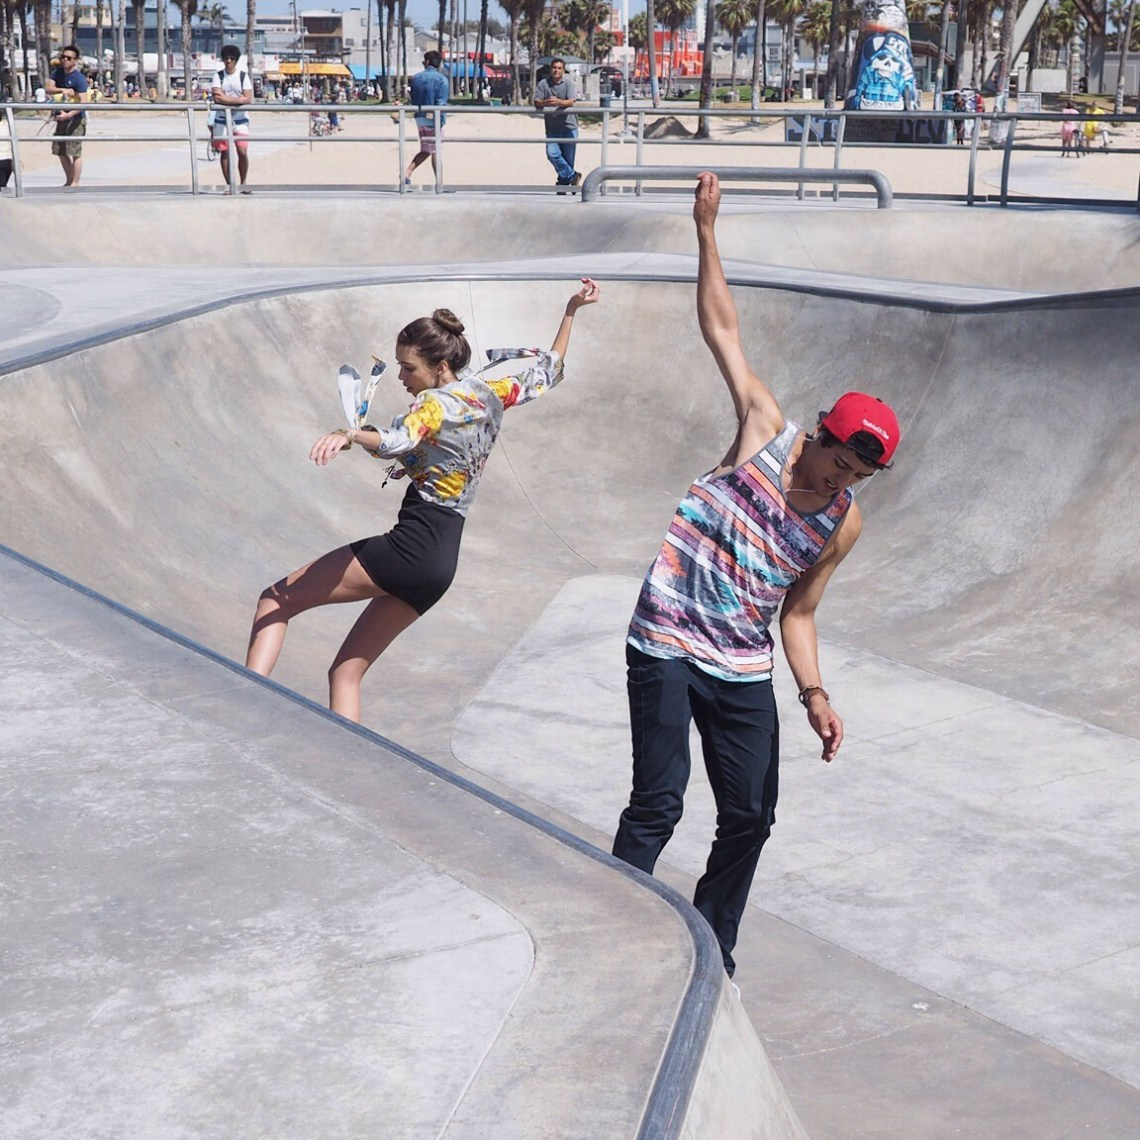 robert cavalli skateboard